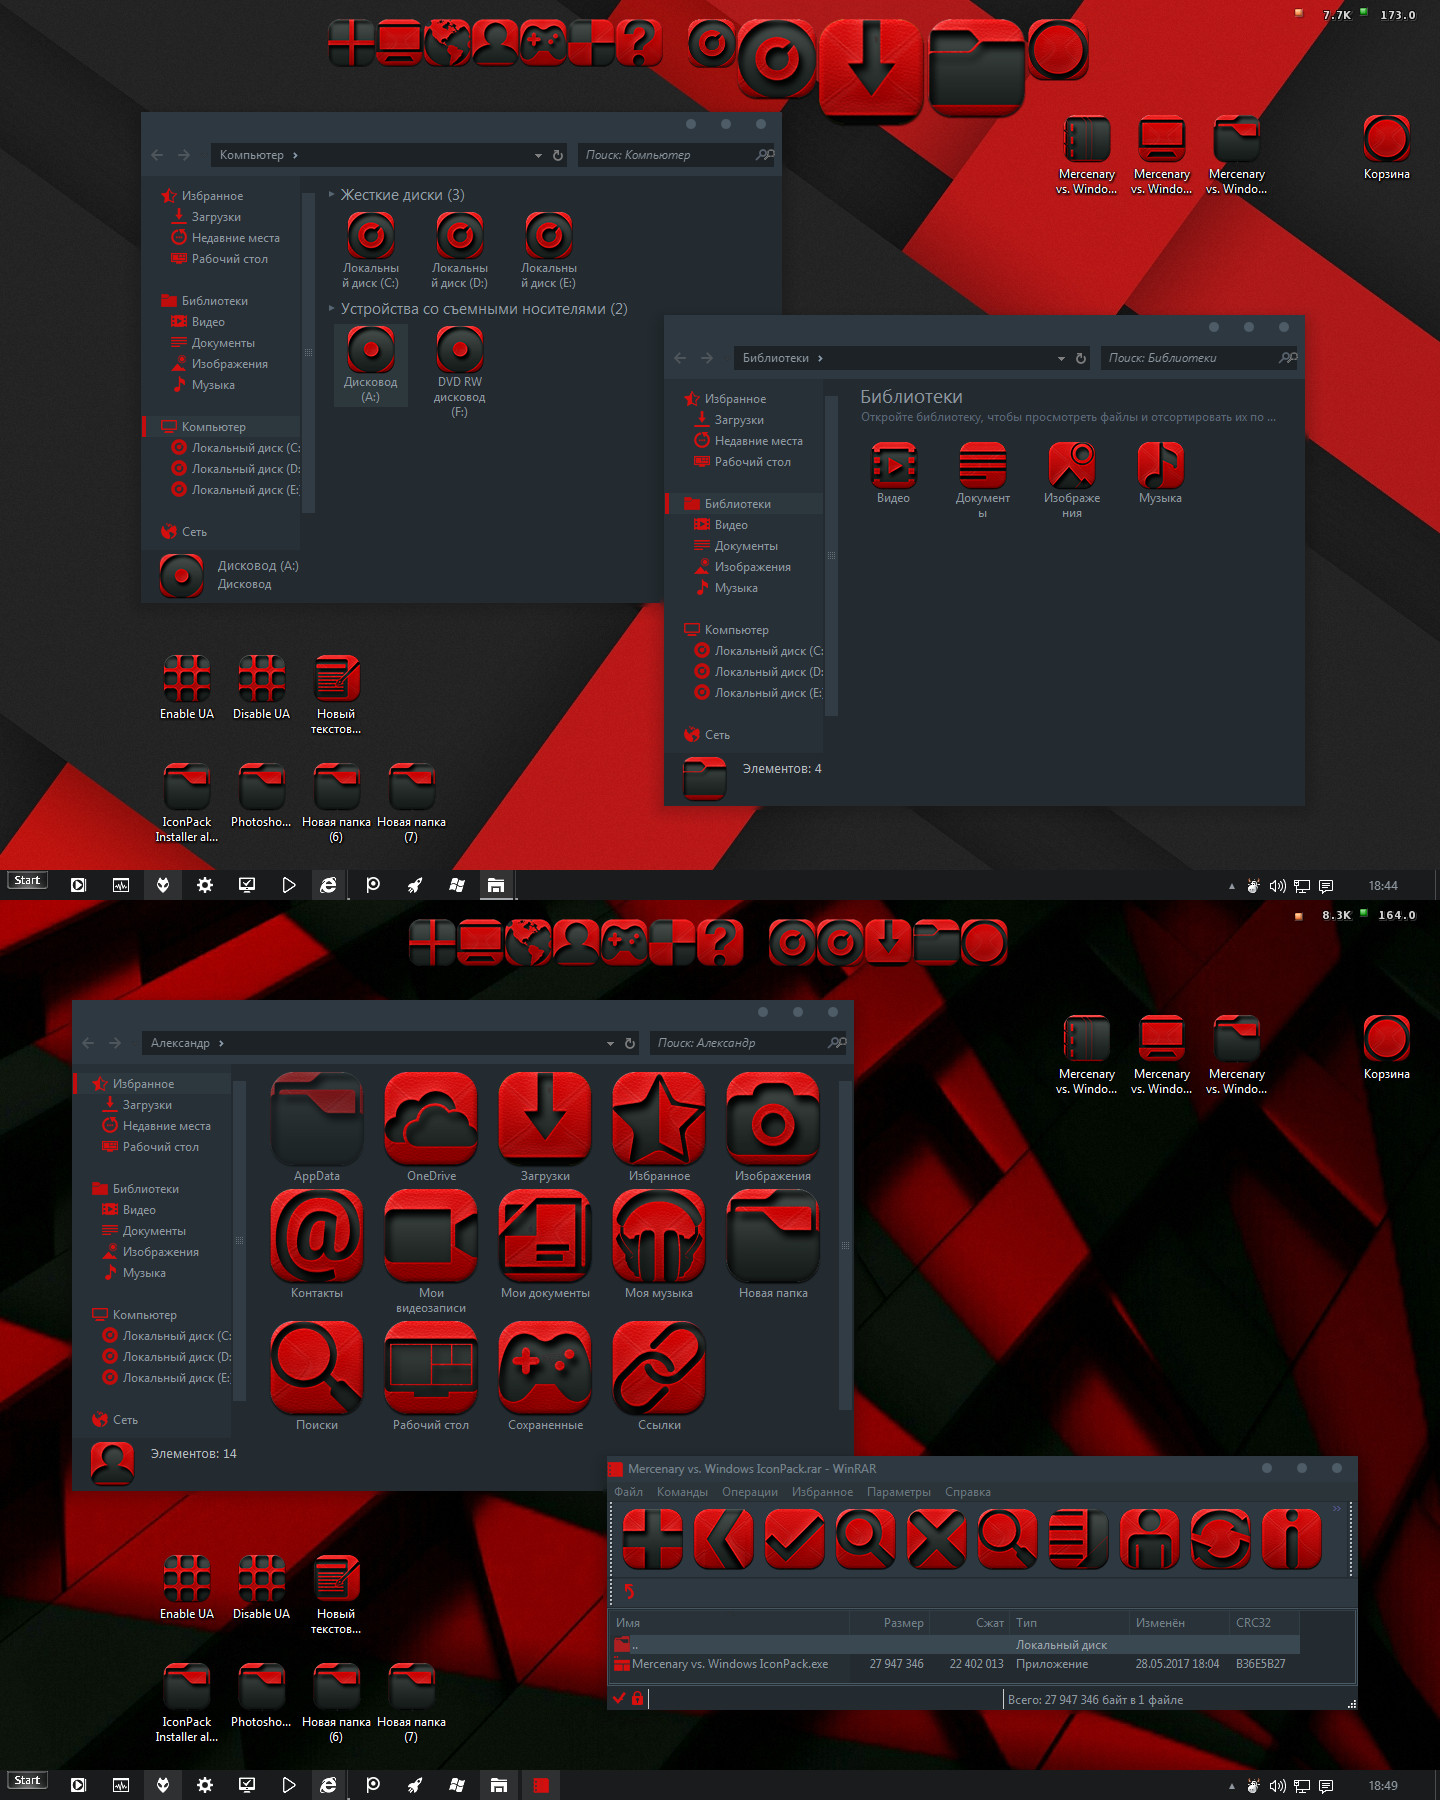 Mercenary vs. Windows IconPack